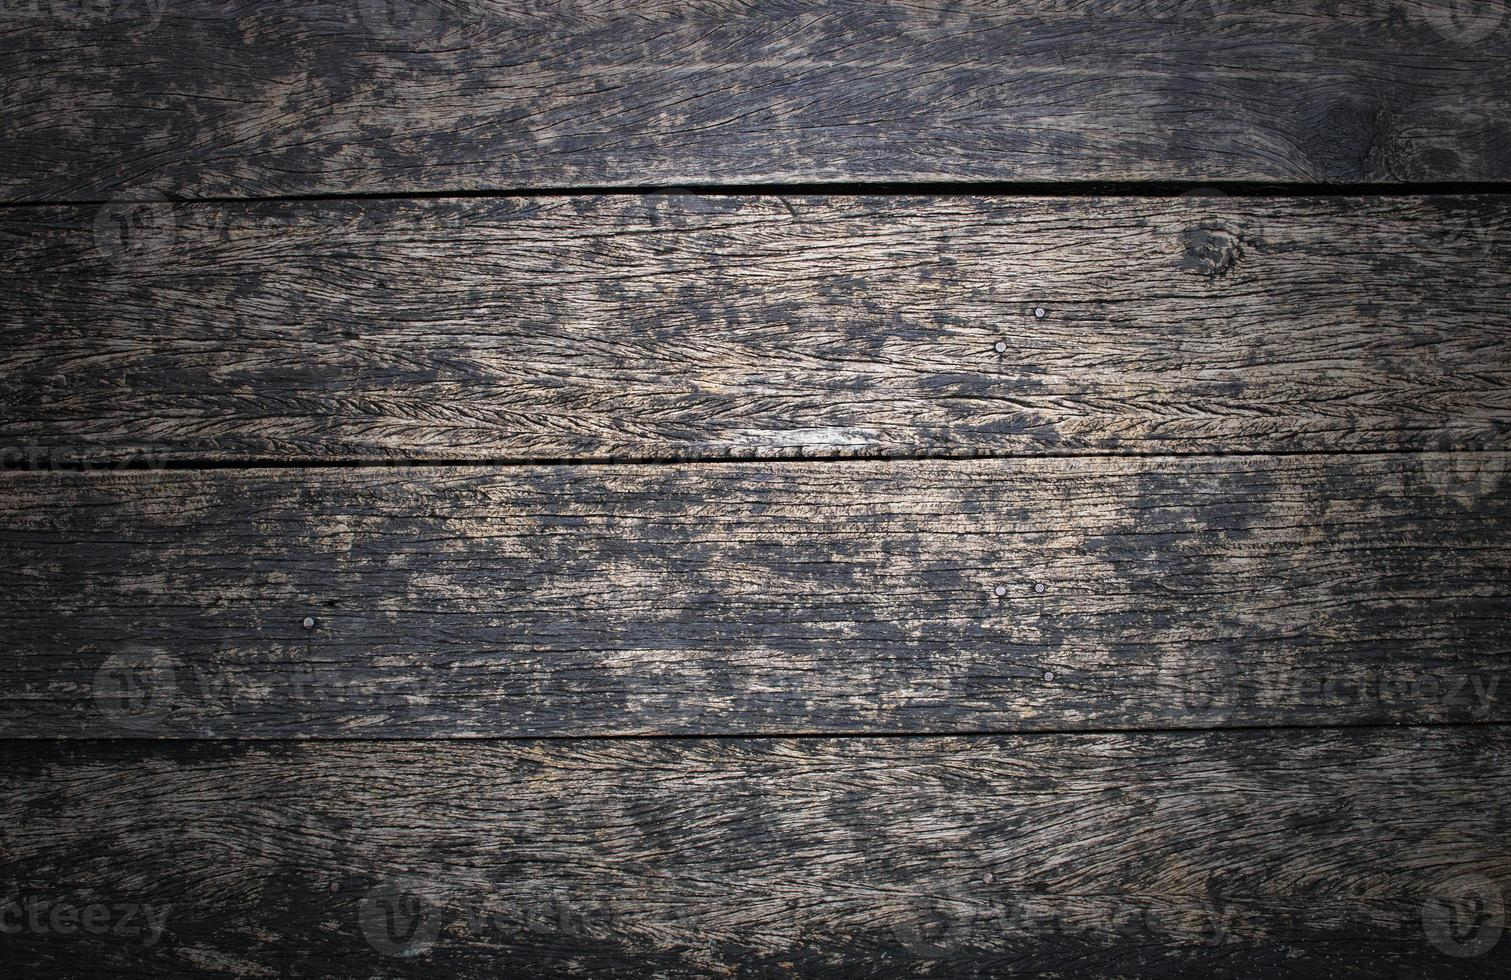 grunge en vintage oude donkere houten achtergrond foto